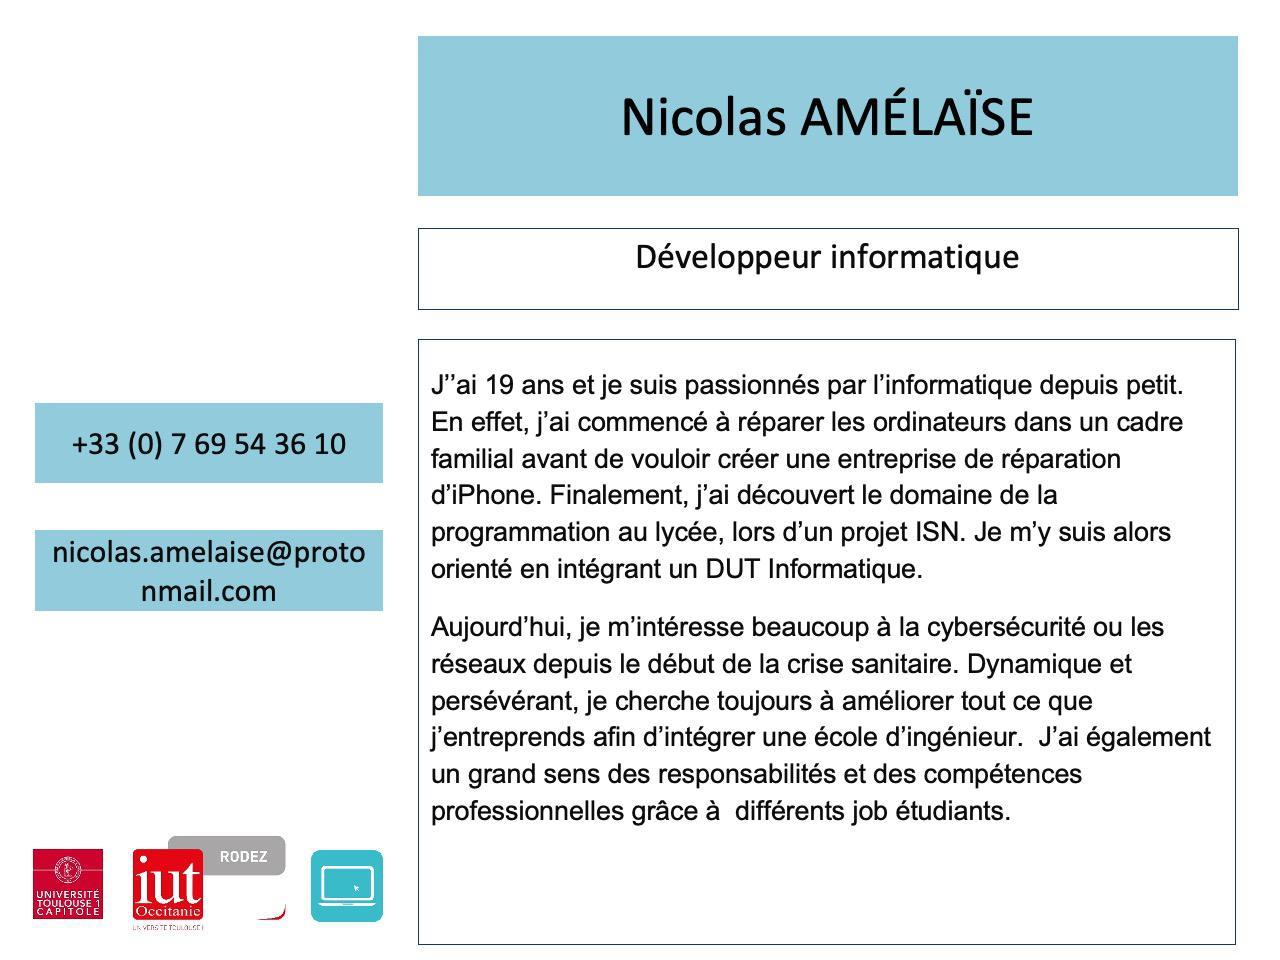 Nicolas Amélaïse